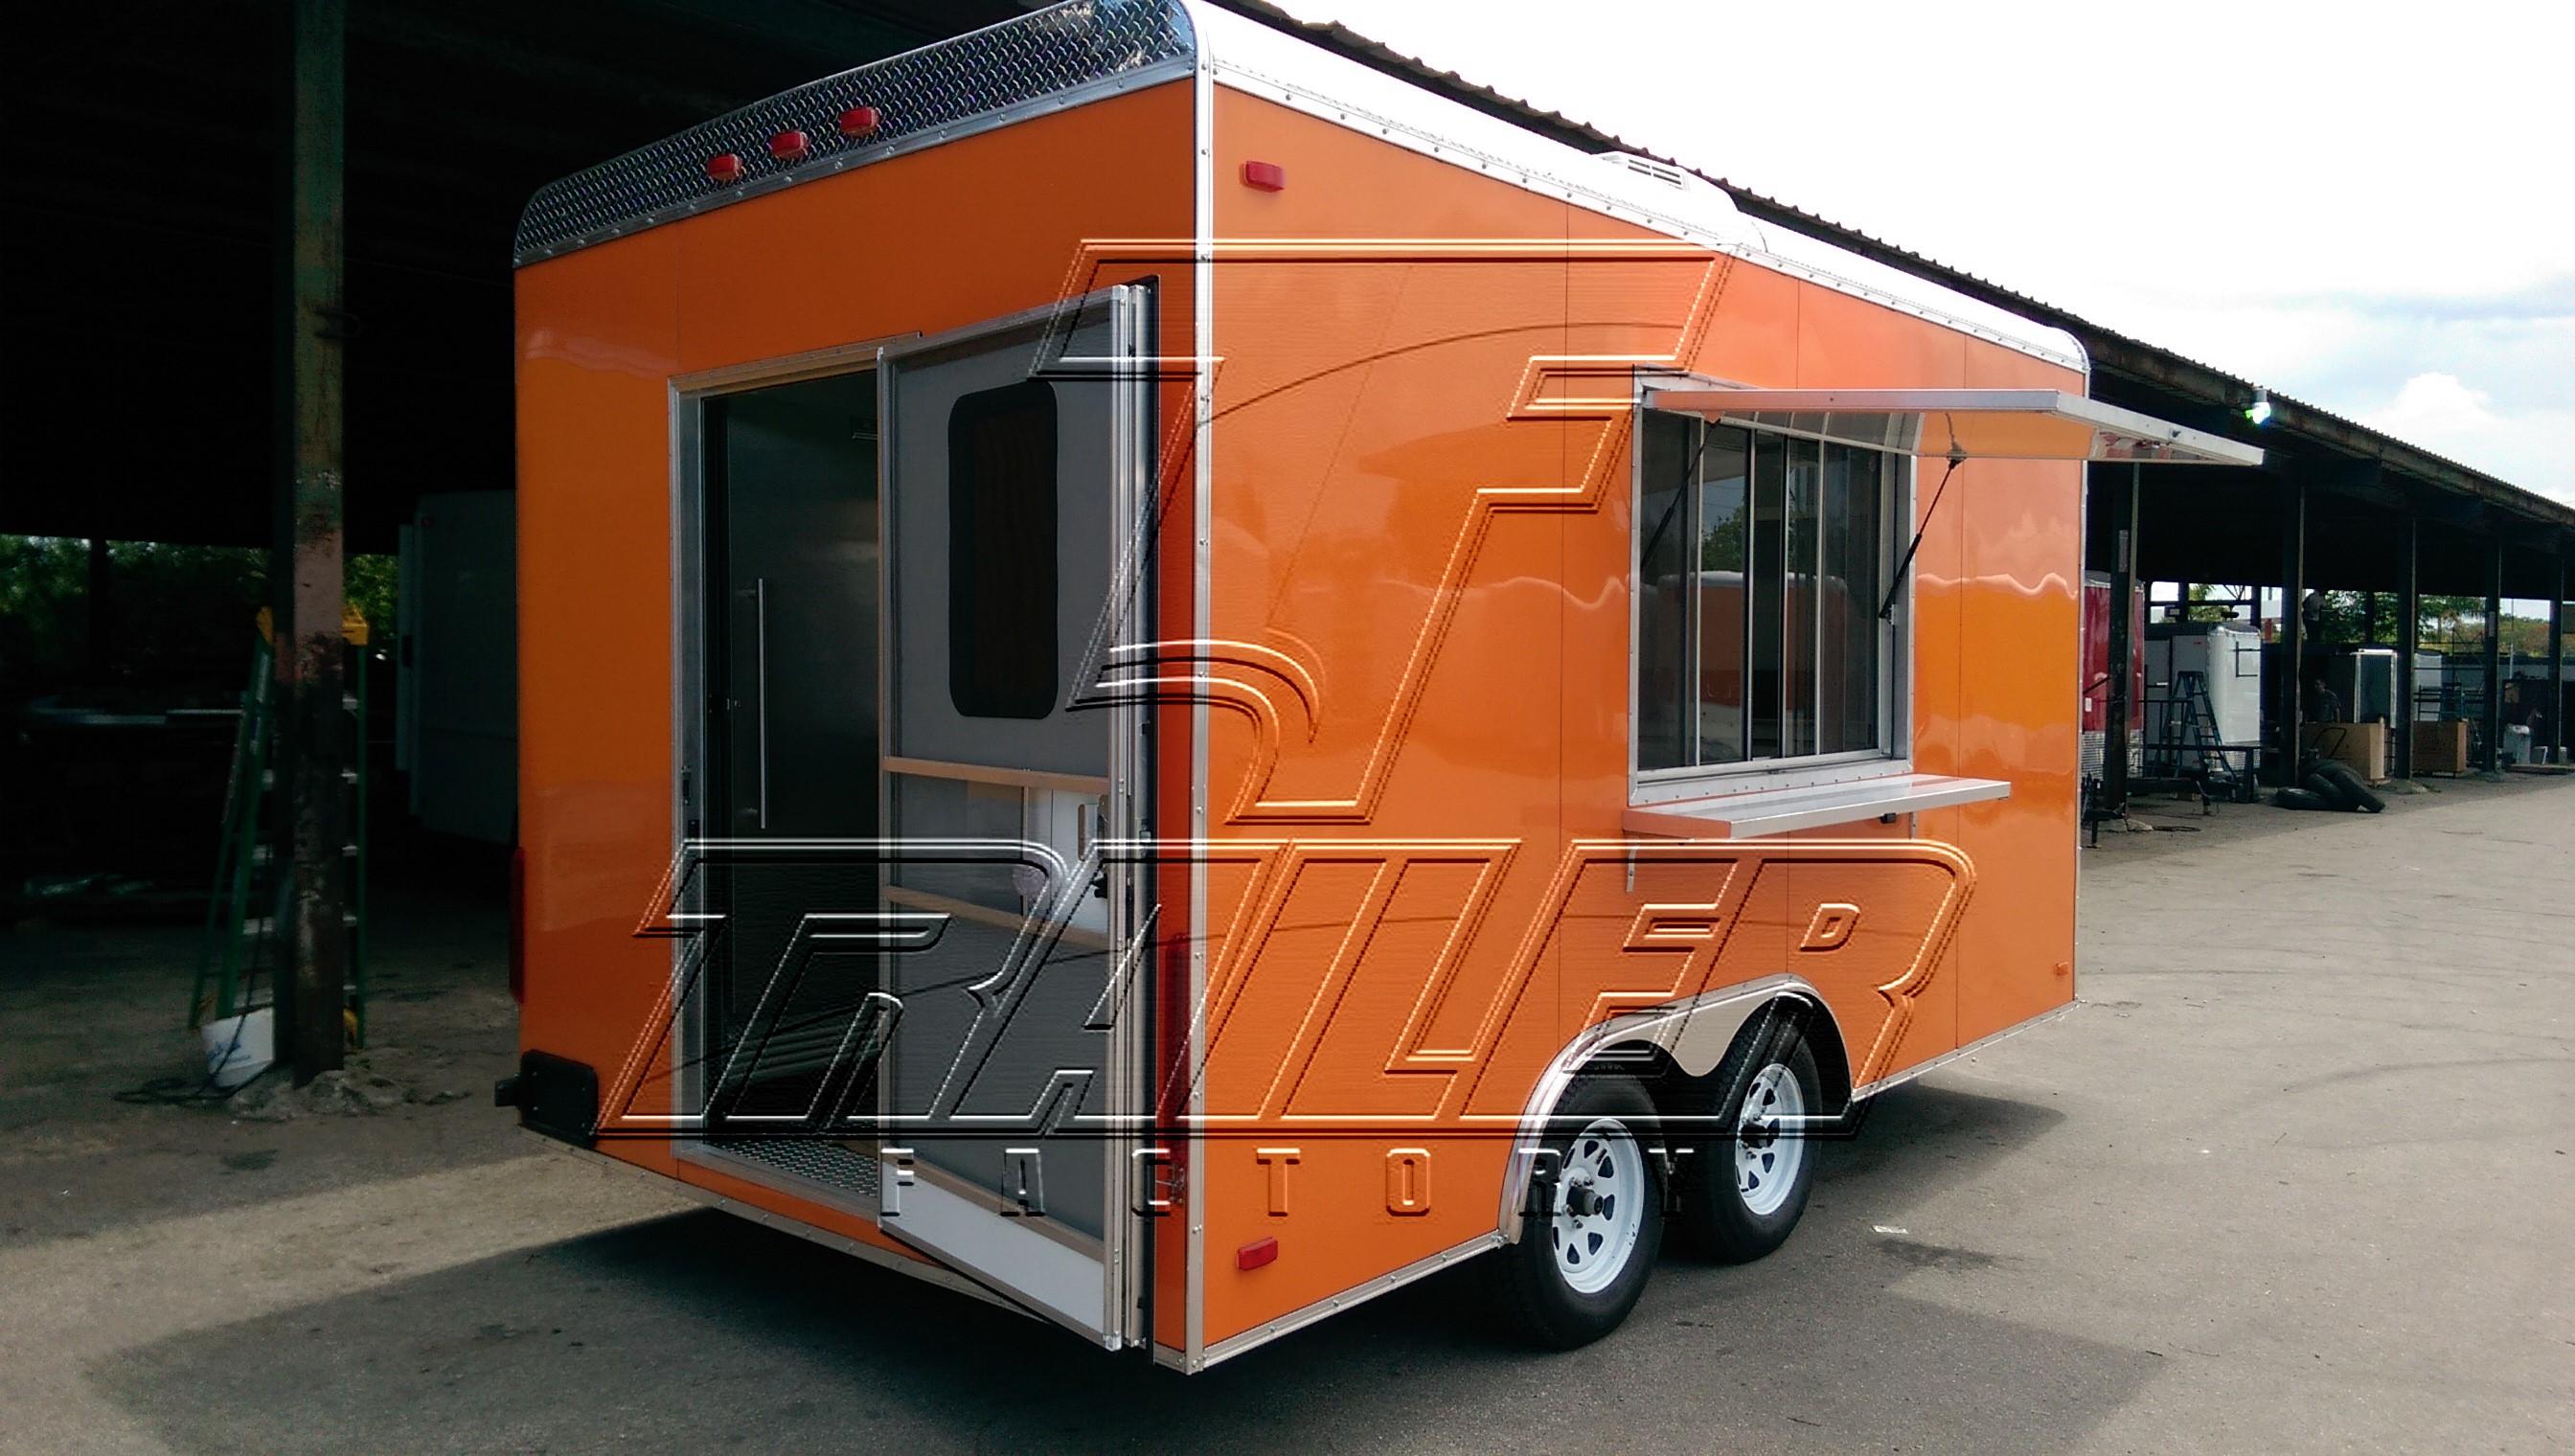 Orange 16ft concession trailer - rear view